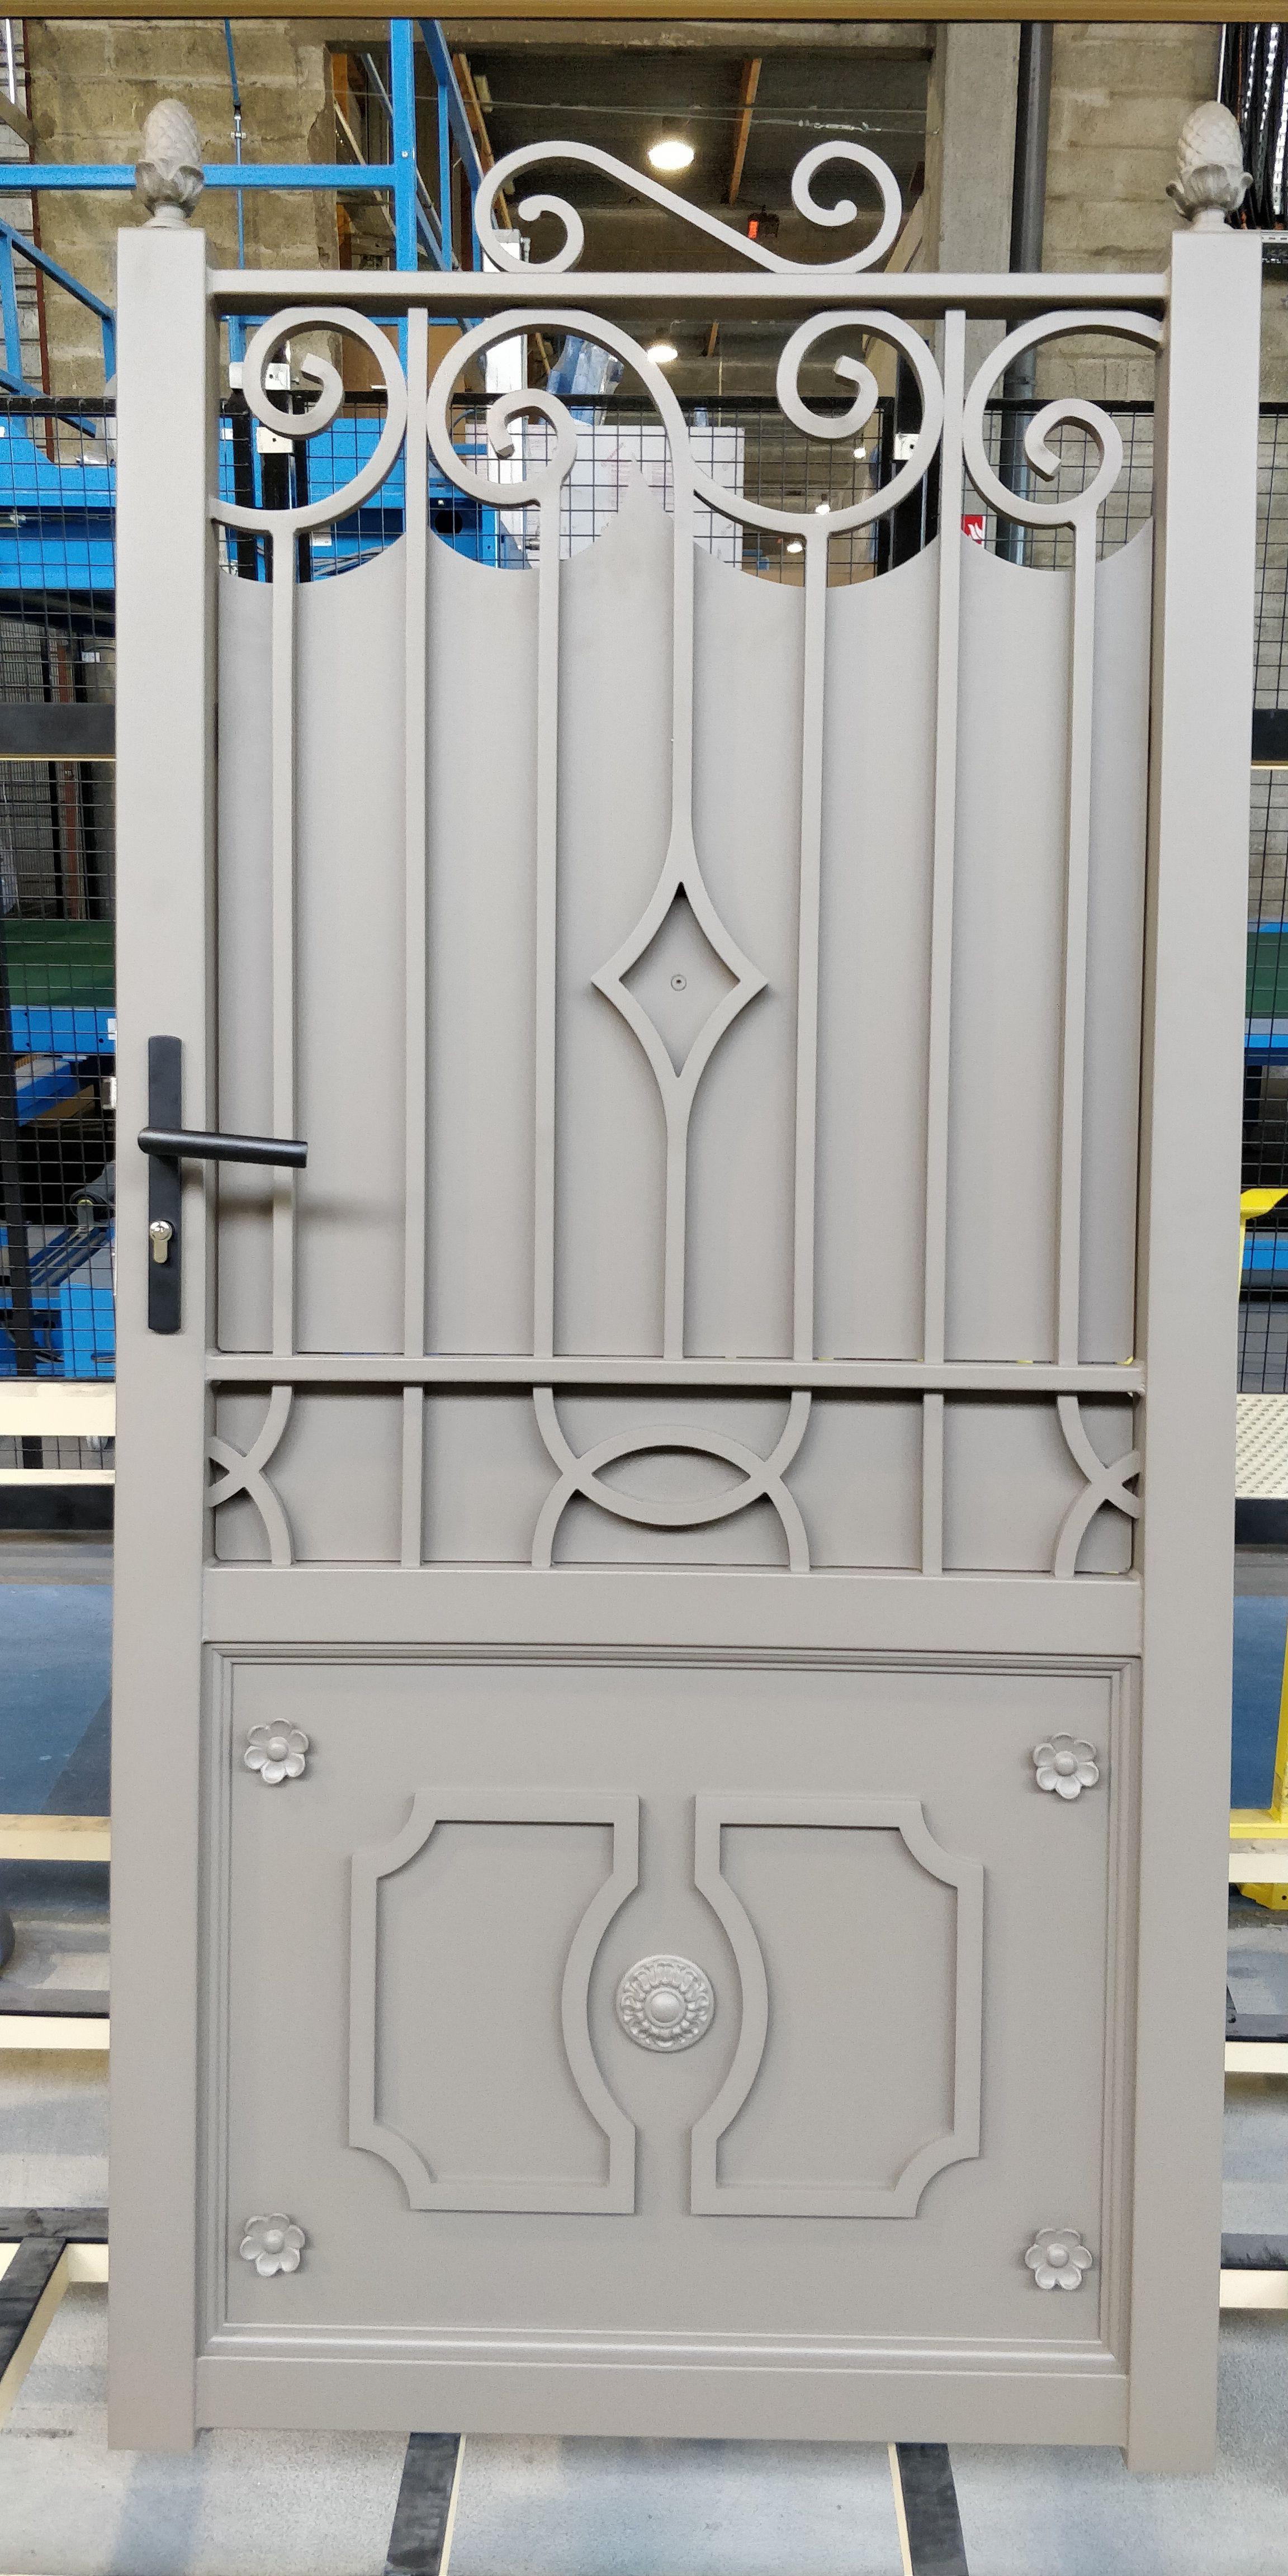 Portillon Alu Soude Ouvrage Portail Portillon Gate Gardecorps Claustra Marquise Aluminium Su En 2020 Cadre De Porte Moulure Portes En Fer Portillon Fer Forge